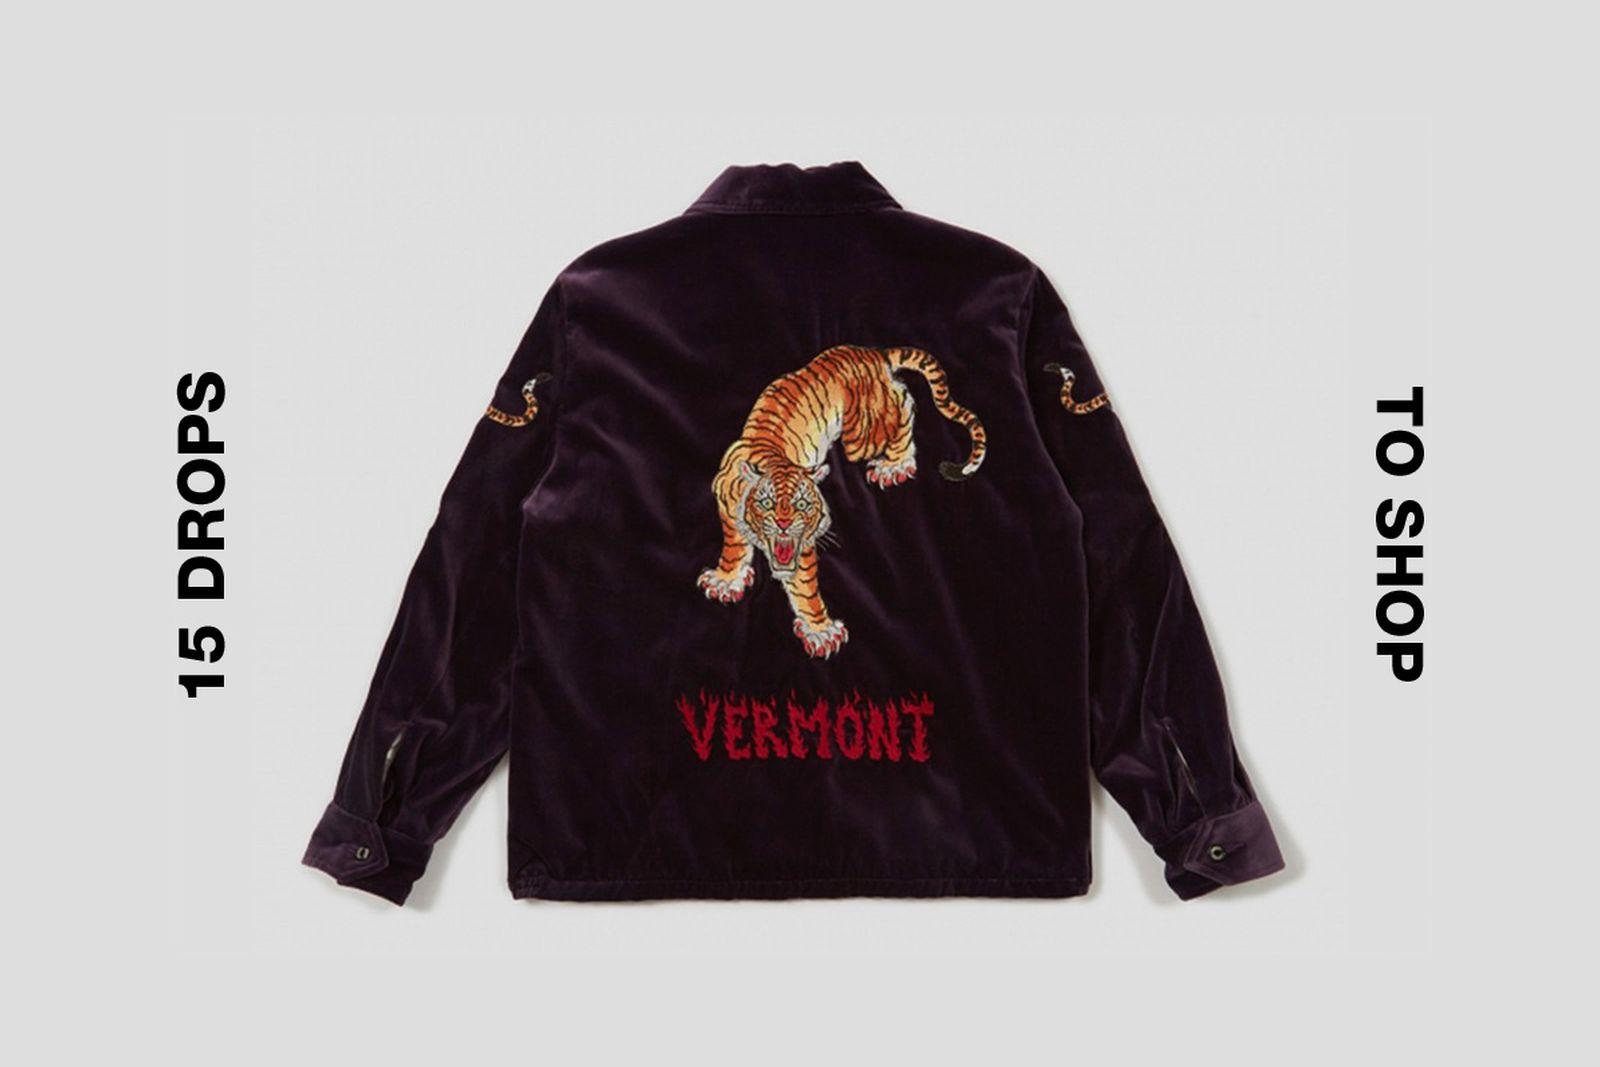 wacko-maria-jacket-best-drops-main